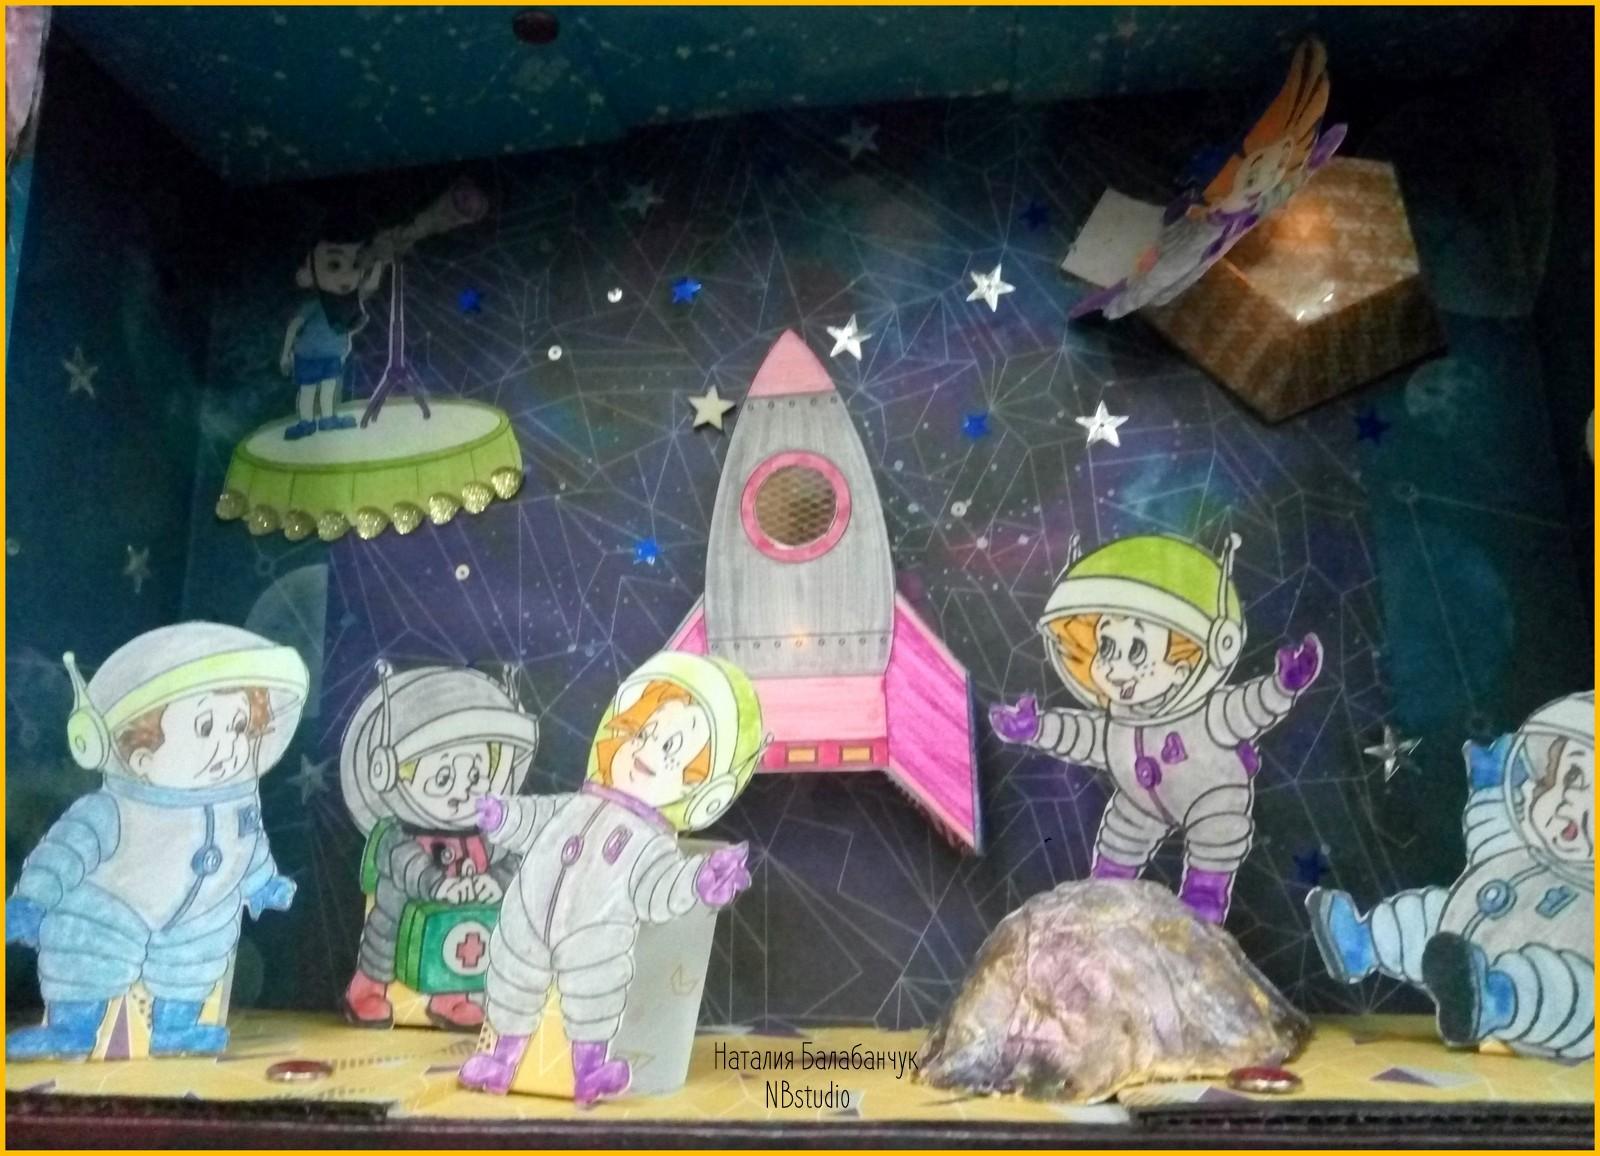 Незнайка на луне открытка день космонавтики, девушка шарами